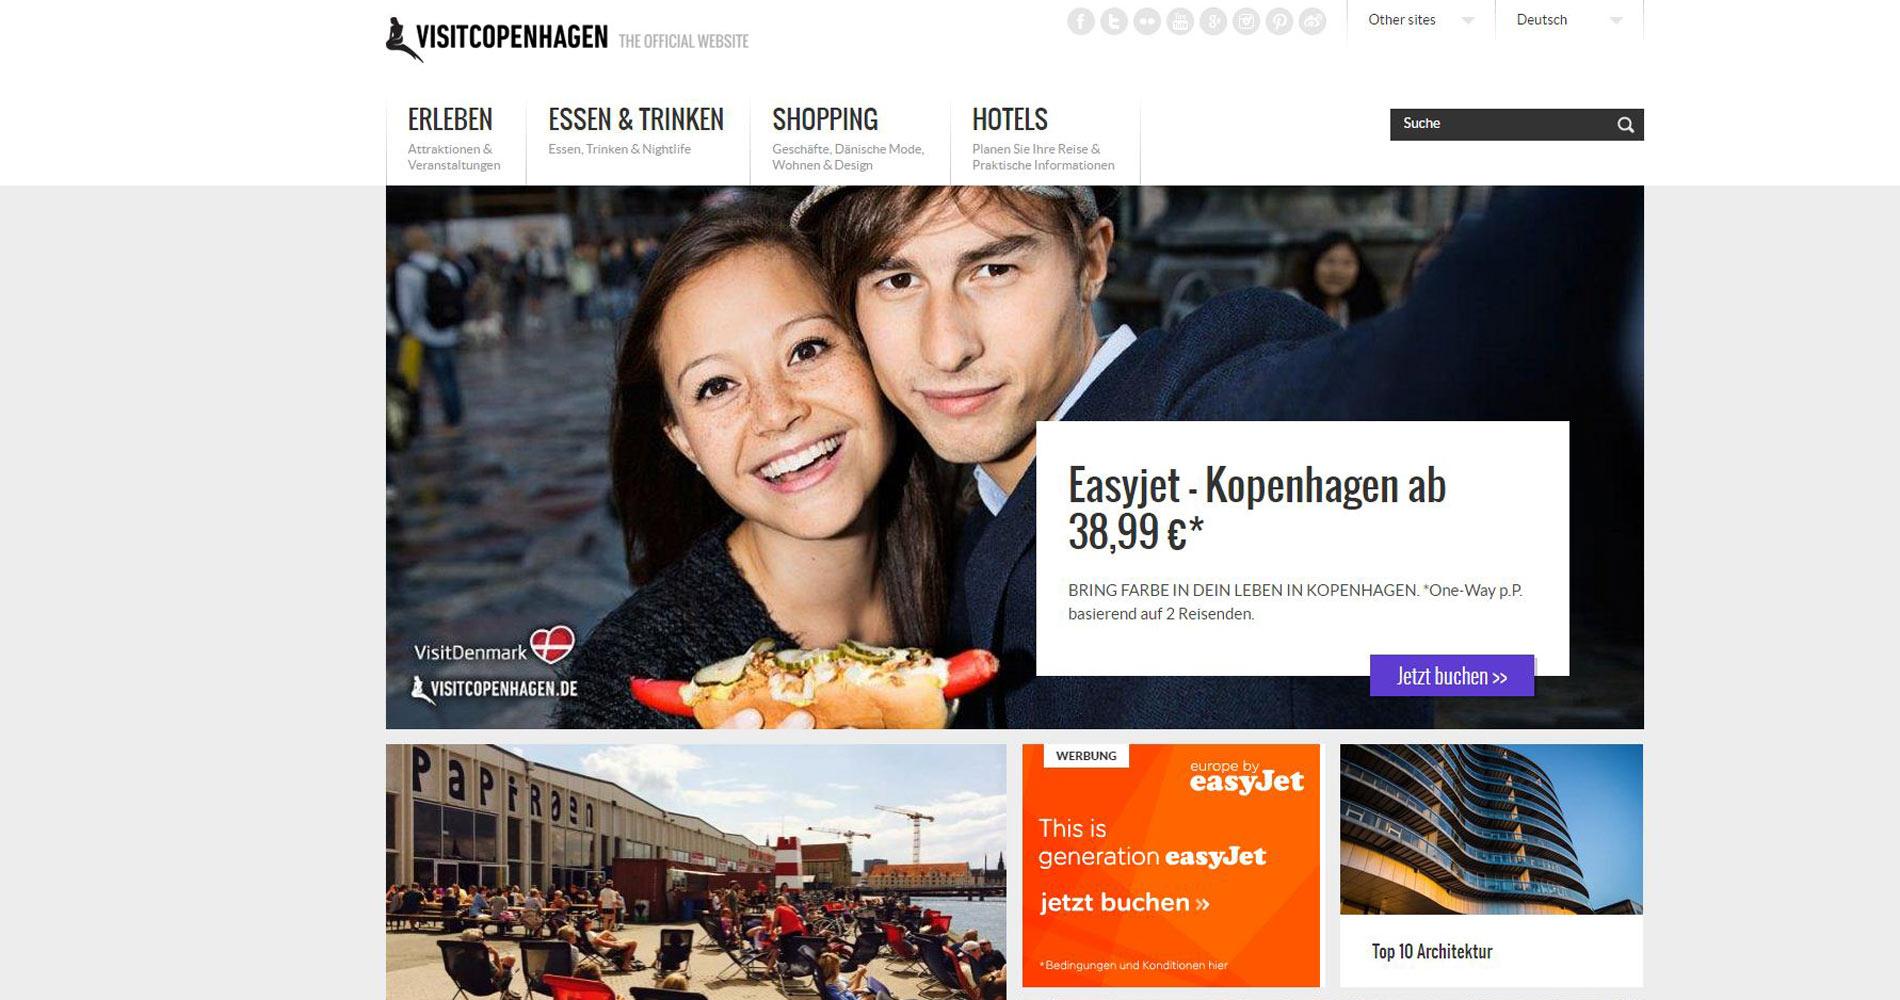 Screenshot der Seite http://www.visitcopenhagen.de/de/kopenhagen/easyjet